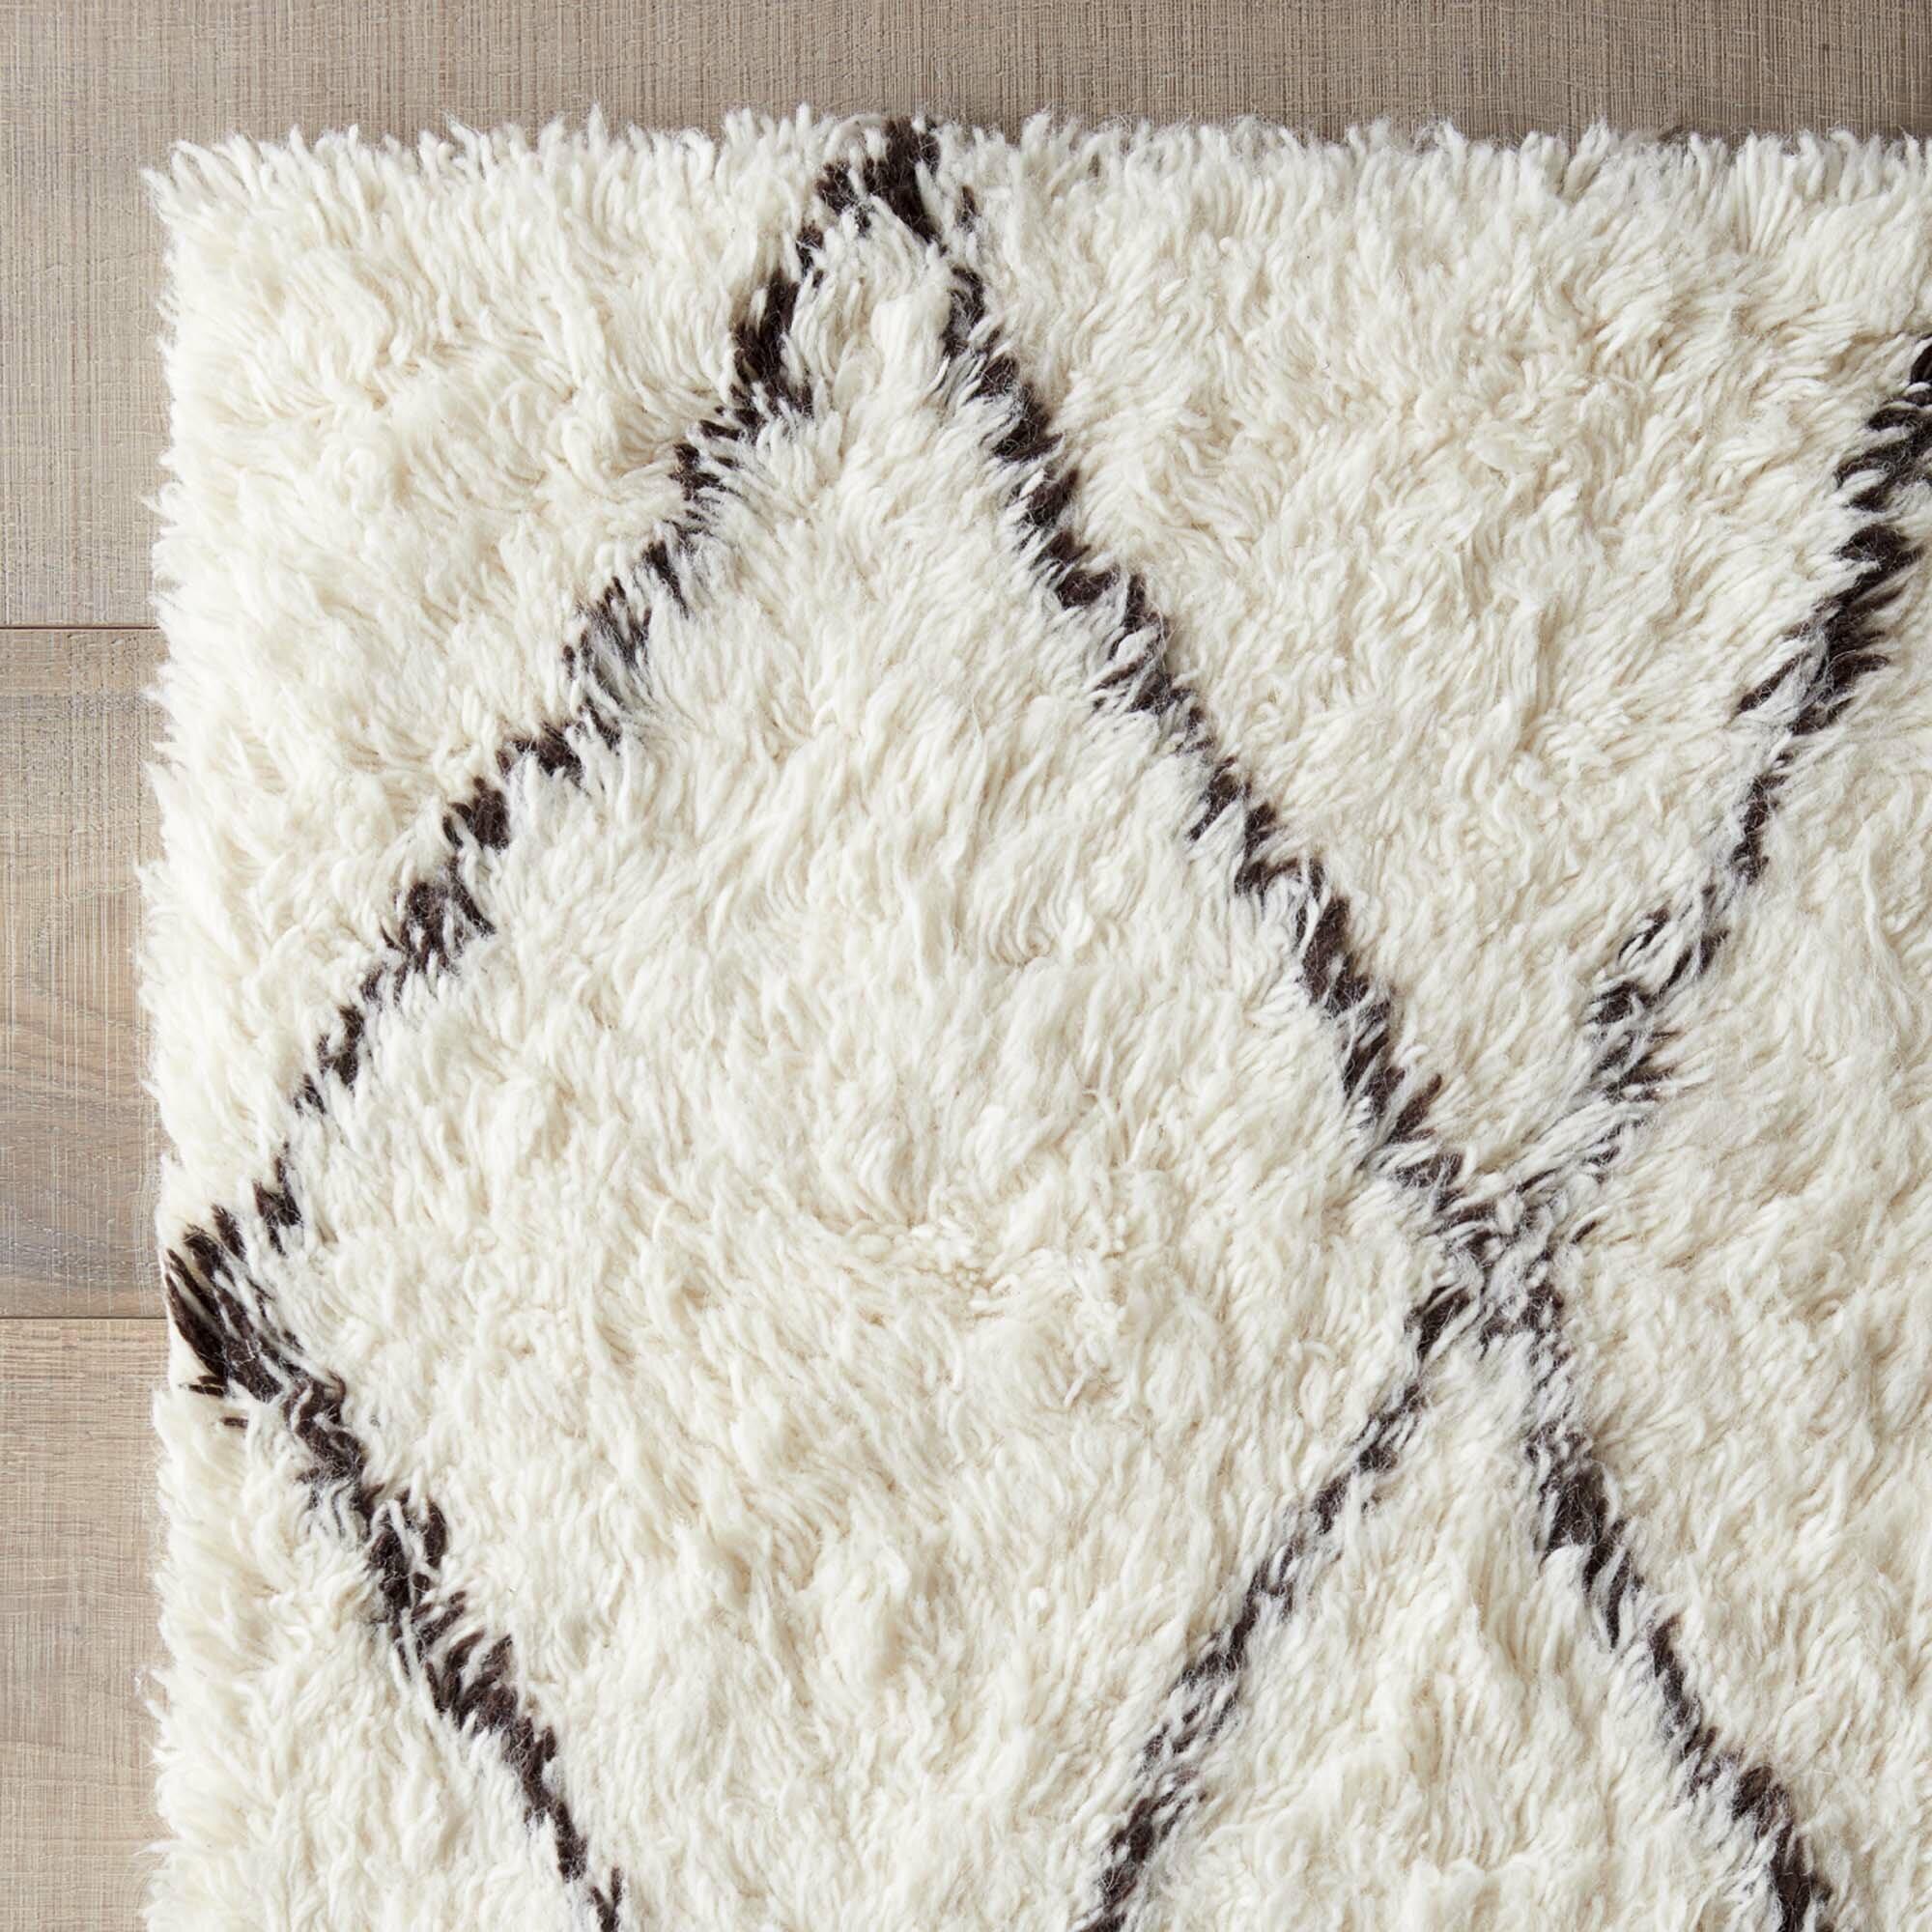 Varick Gallery Simonds Off-White/Brown Shag Area Rug